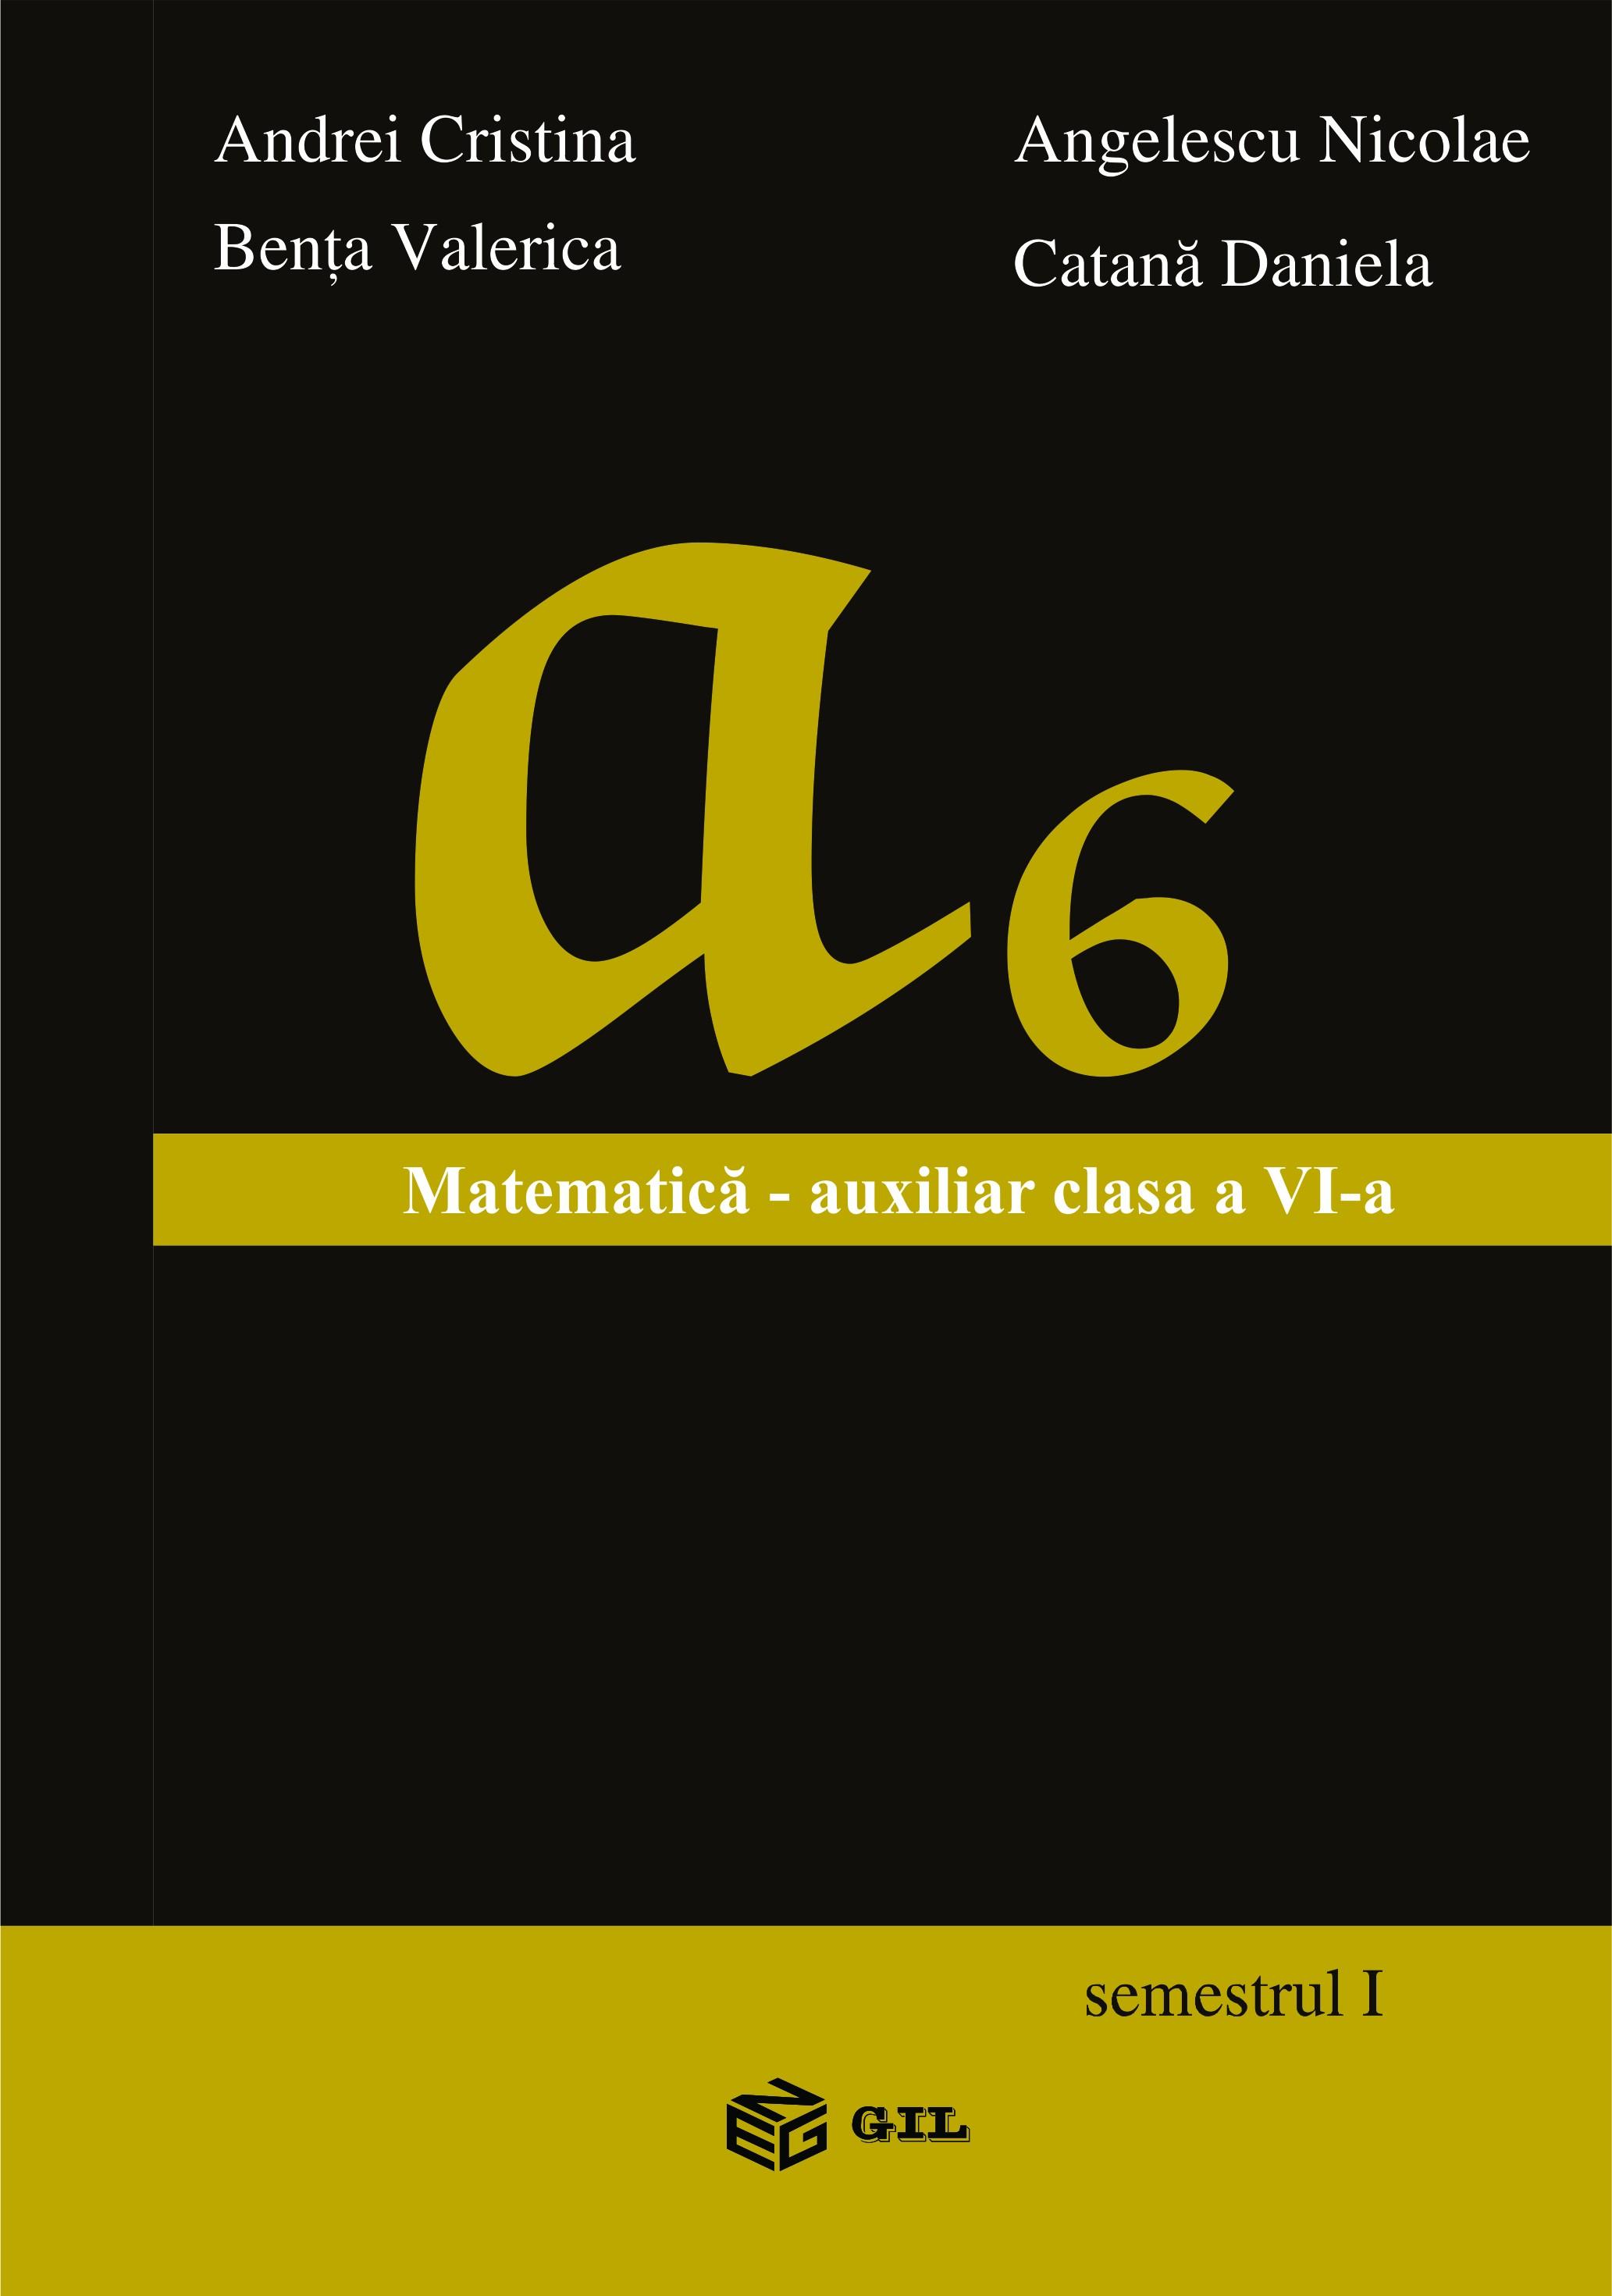 Matematica - Auxiliar pentru clasa a VI-a (semestrul I)